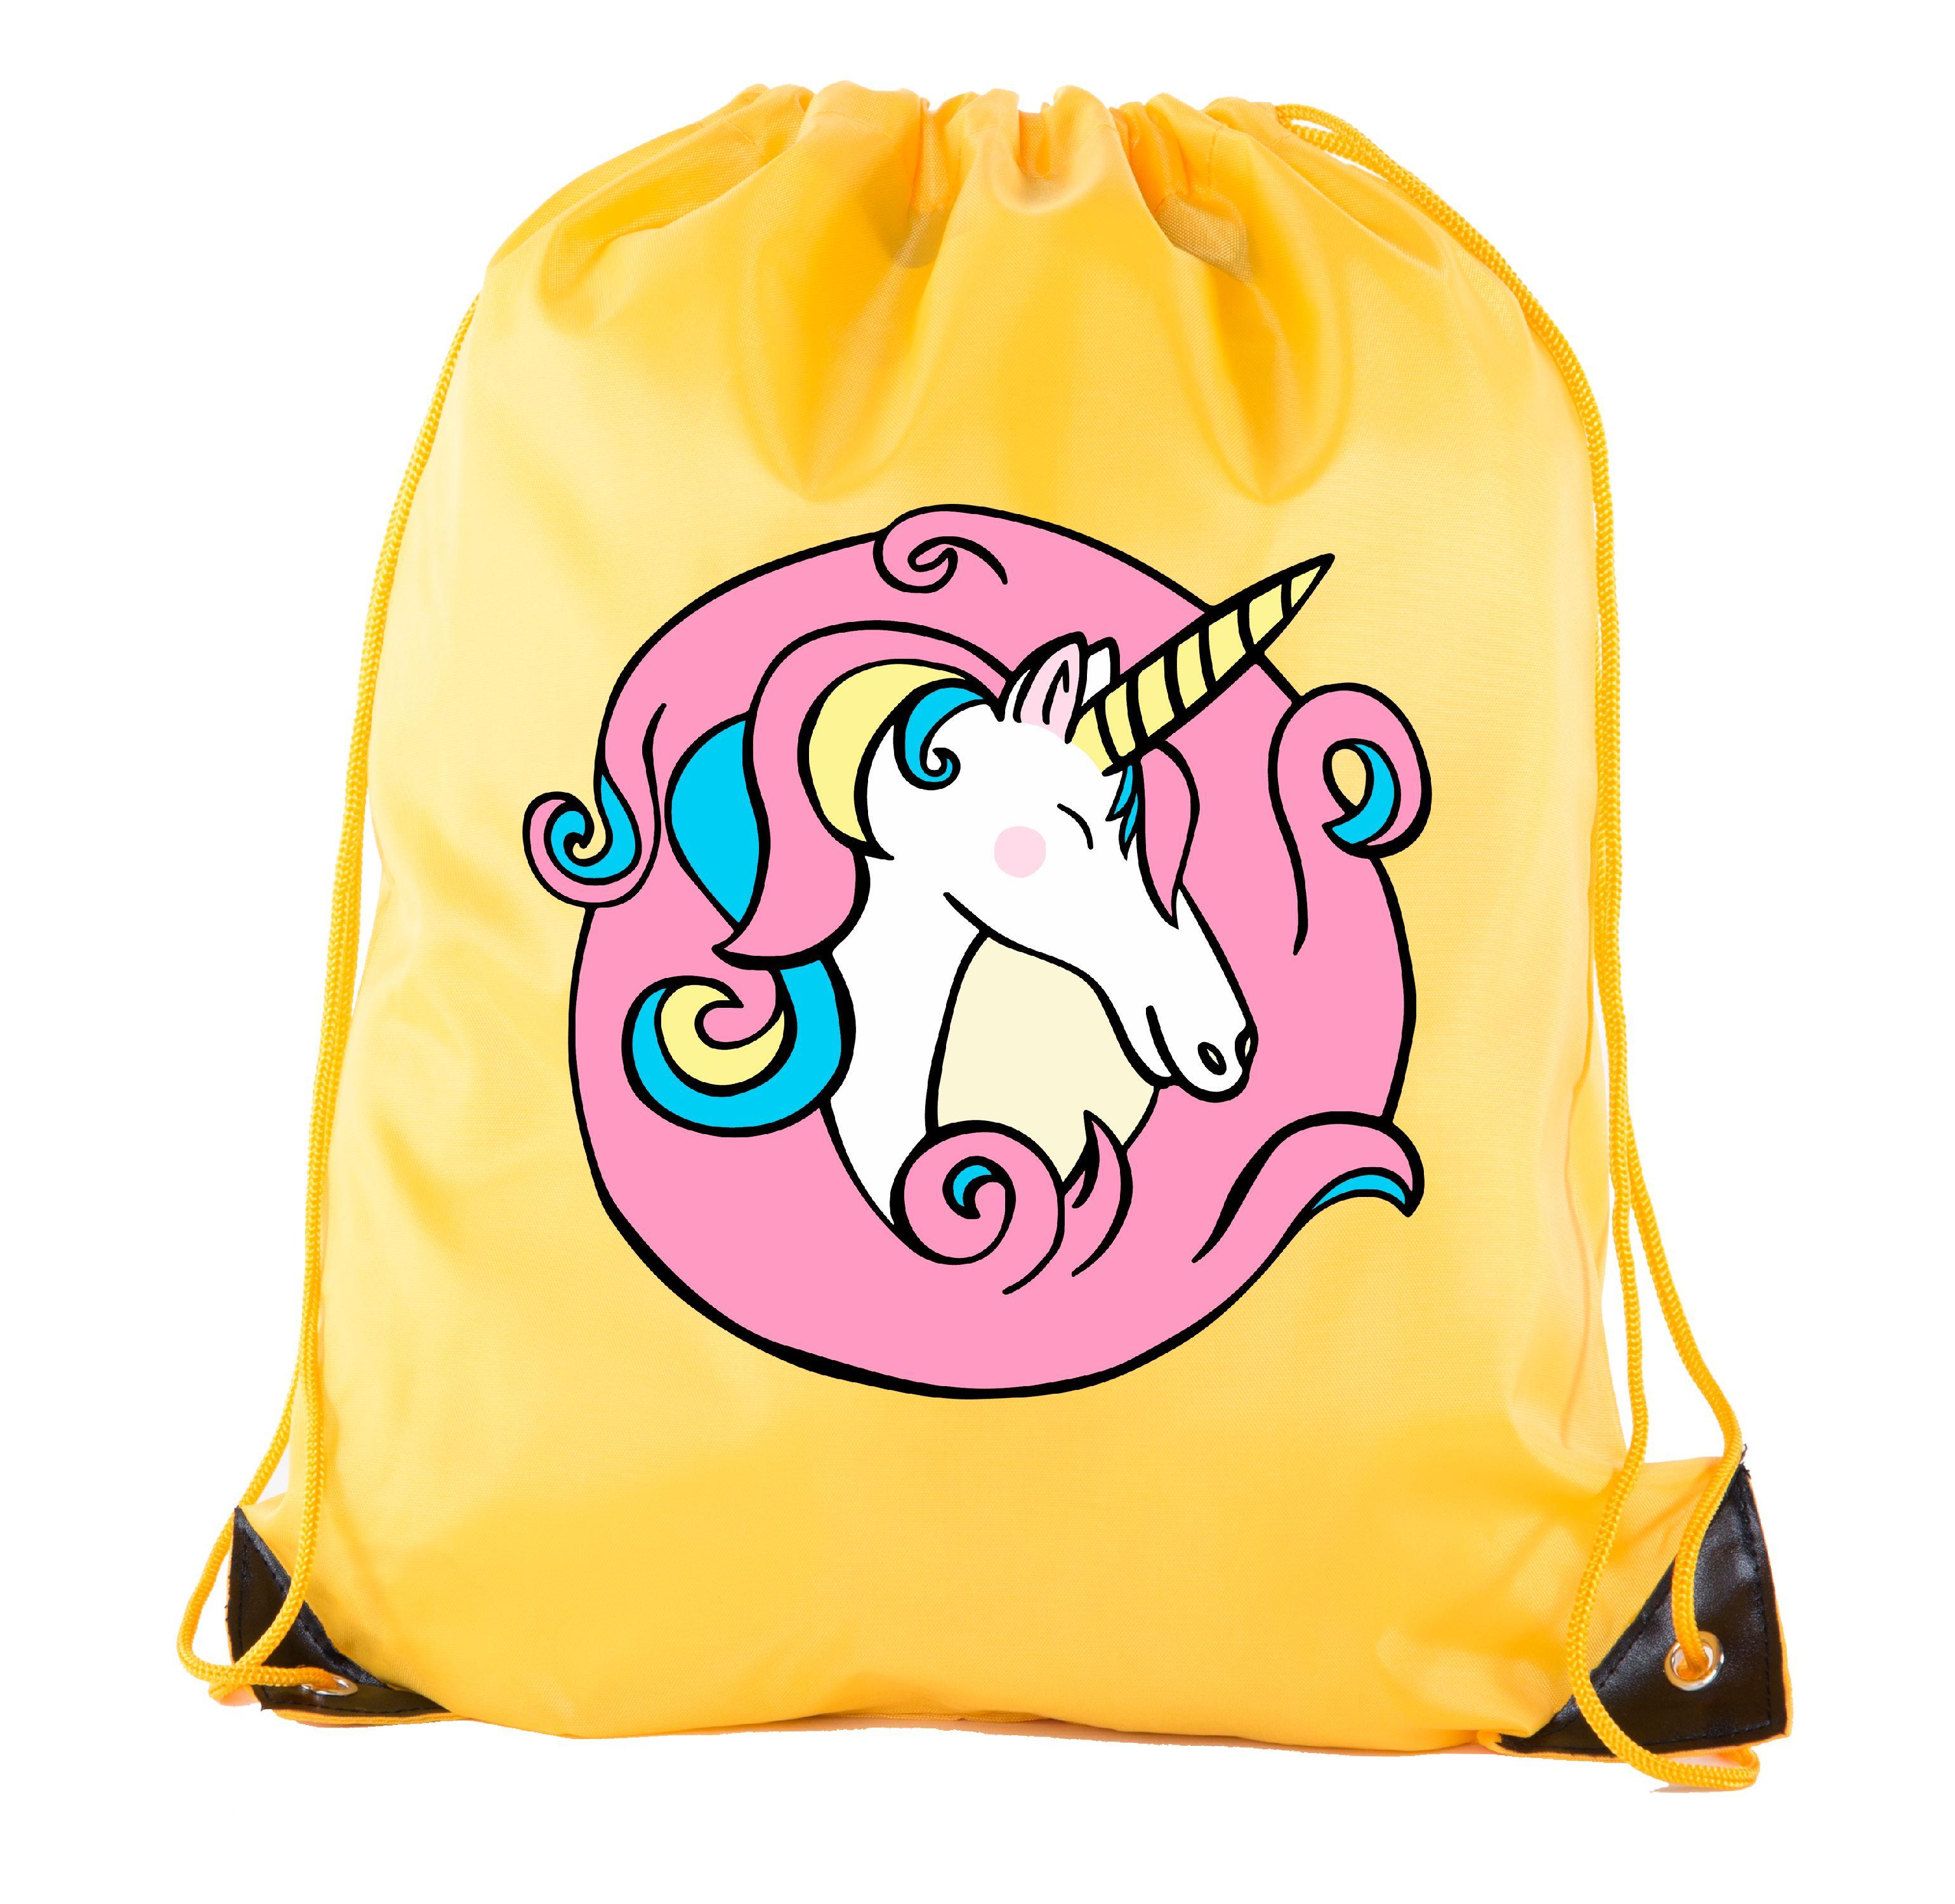 Unicorn Drawstring Bags Unicorn Treat Bags for Birthday Gift Bags & Baby Showers